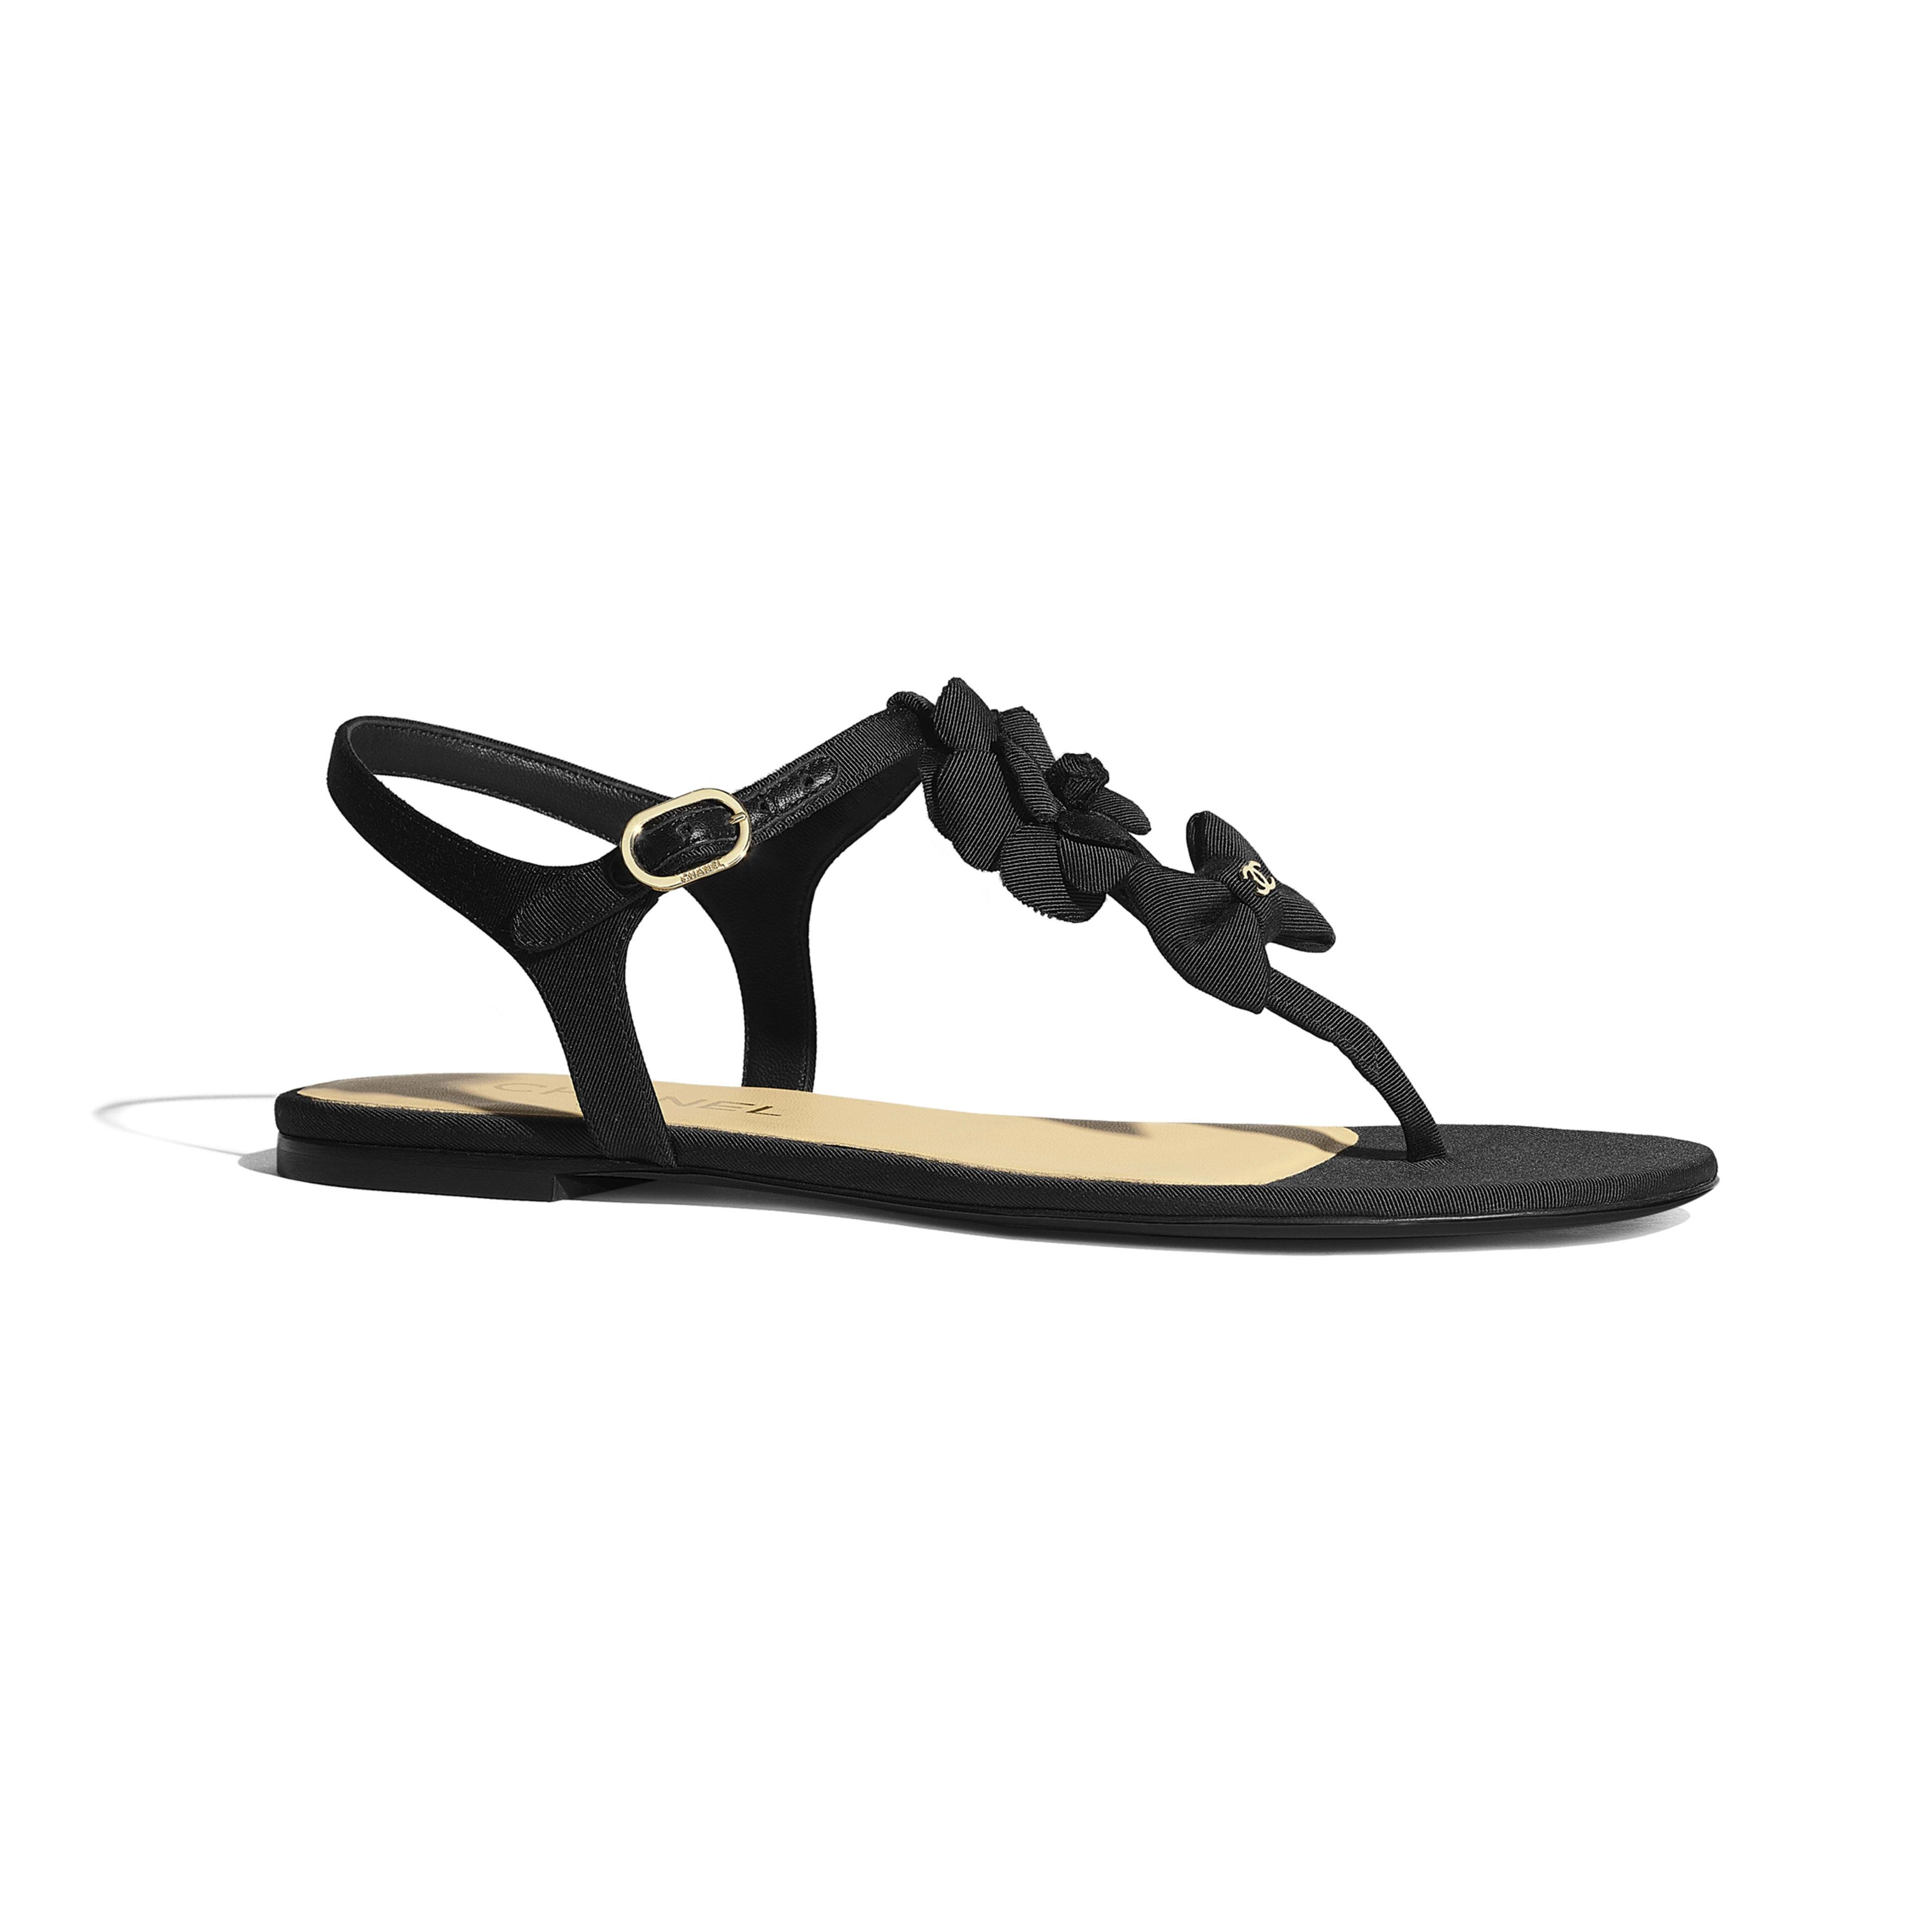 Sandals - Black - Grosgrain - Default view - see full sized version